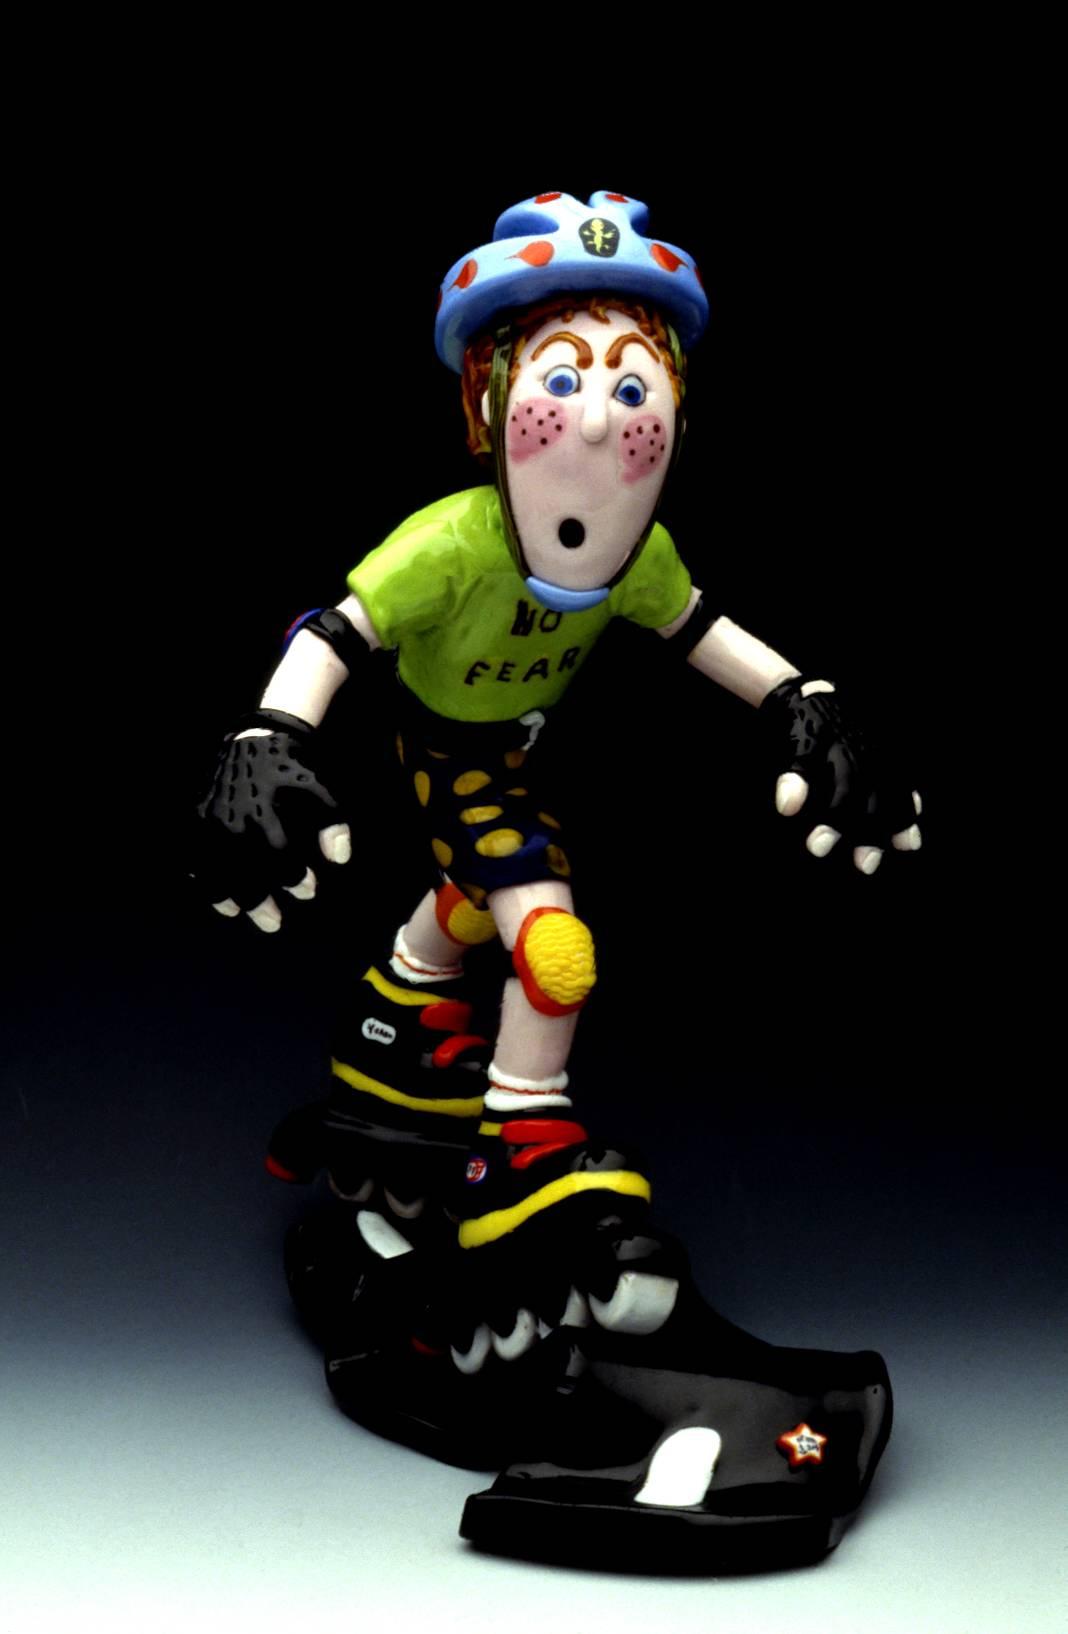 No Fear Skater Dude